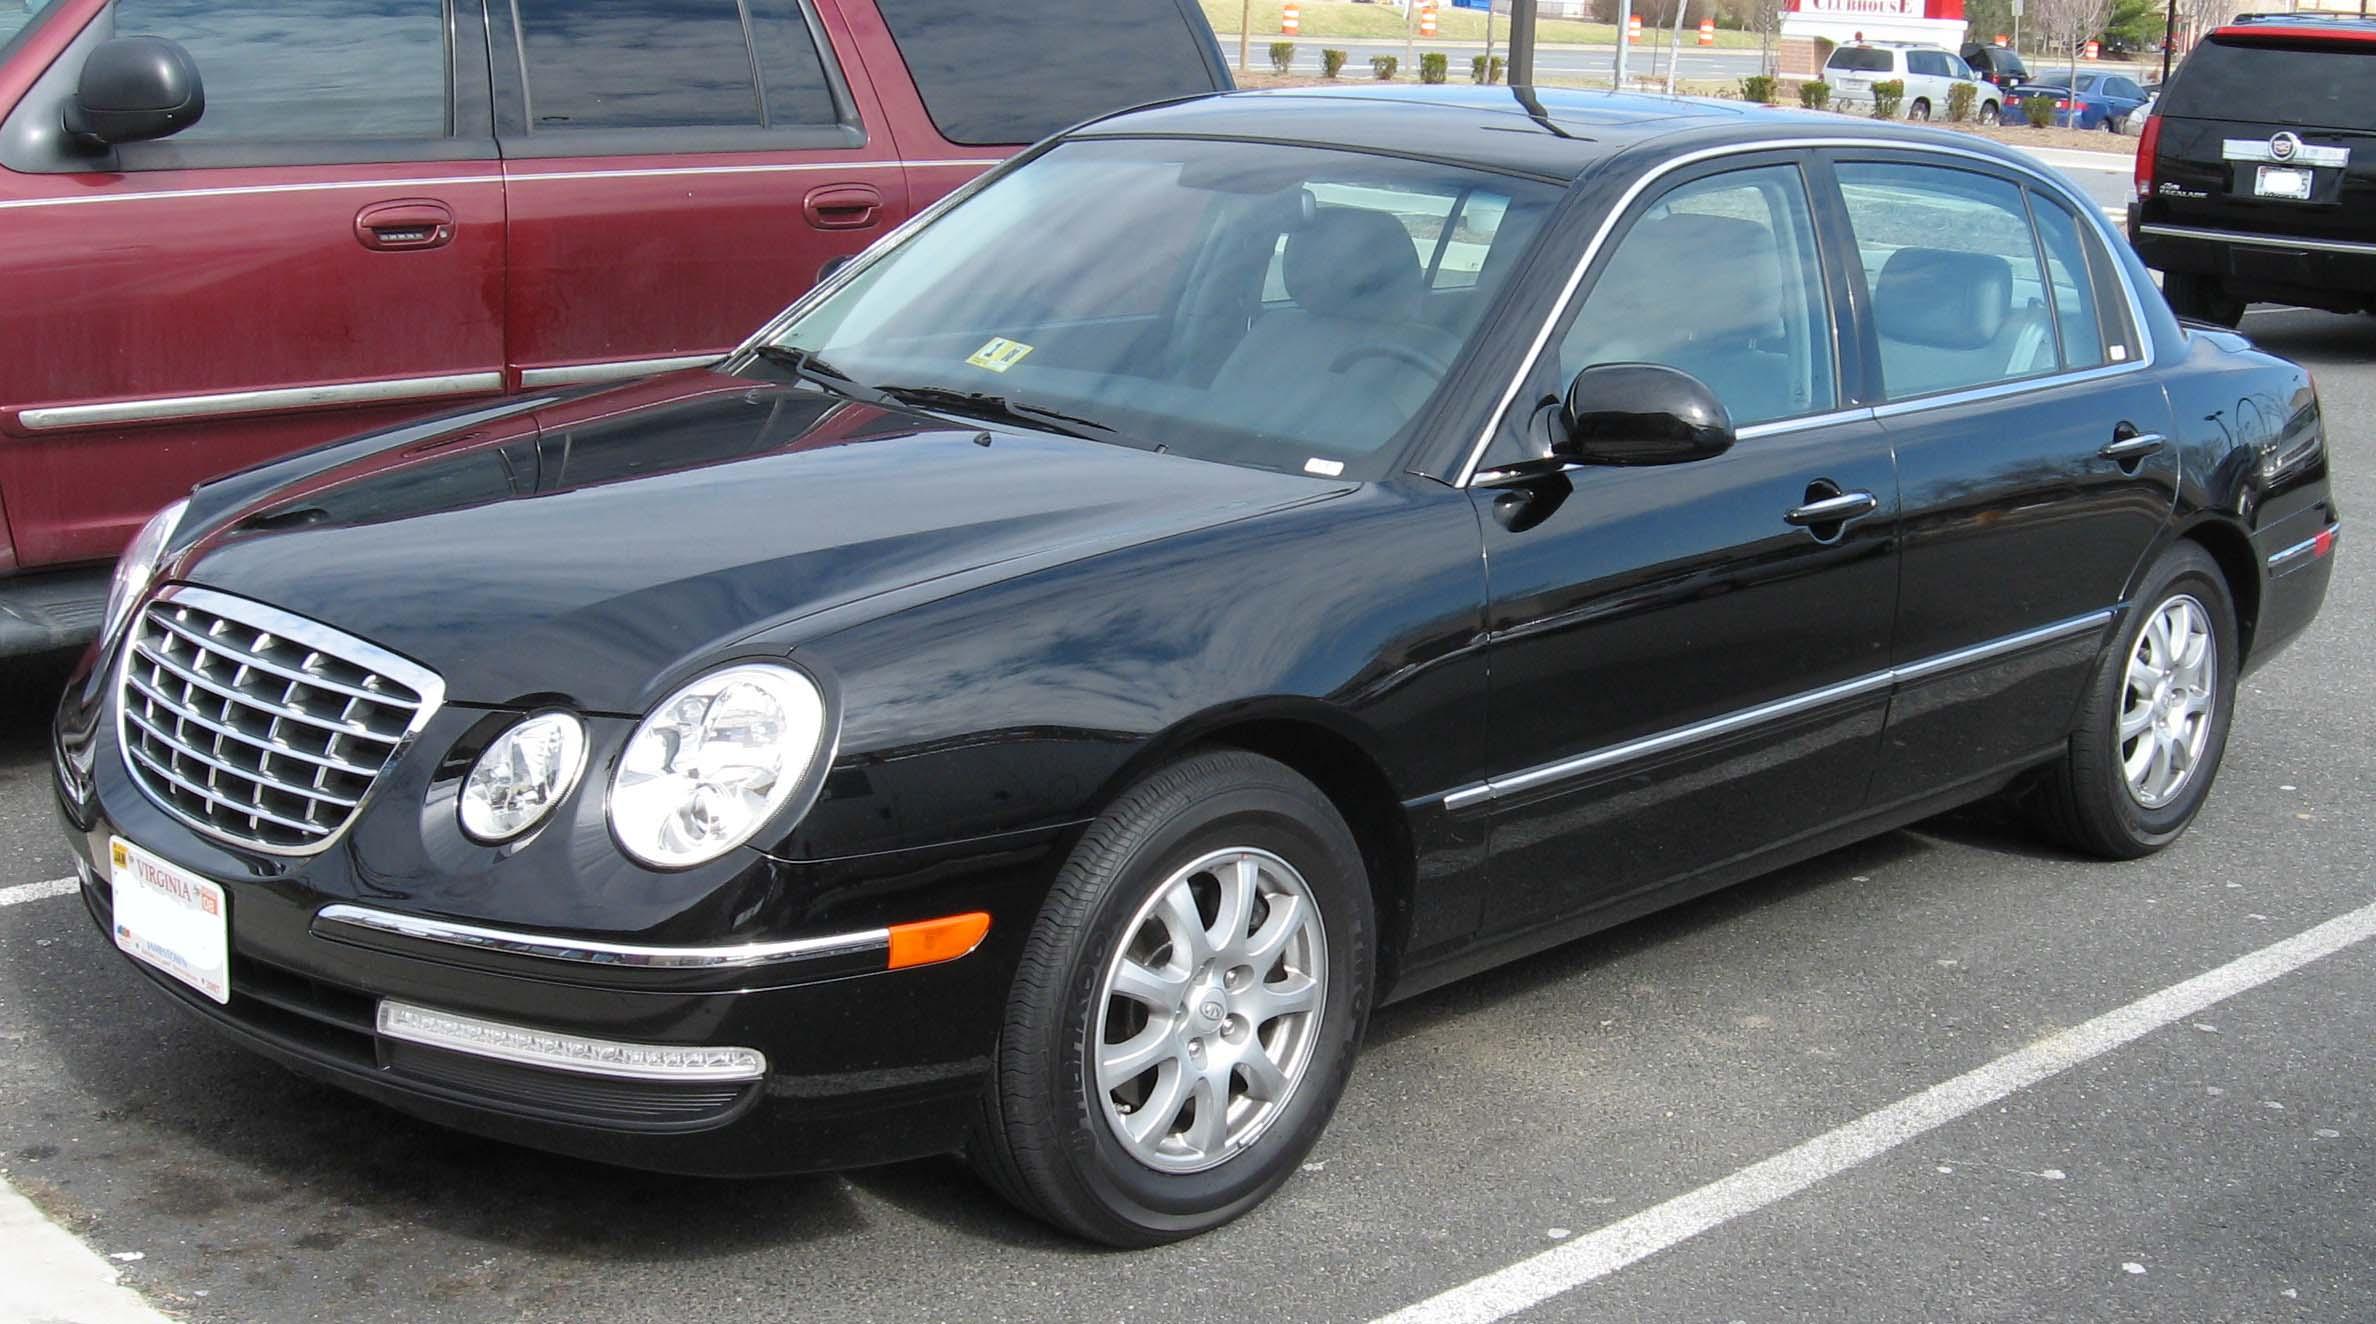 Value Kia Philadelphia >> Cash for Cars Philadelphia, PA | Sell Your Junk Car | The Clunker Junker